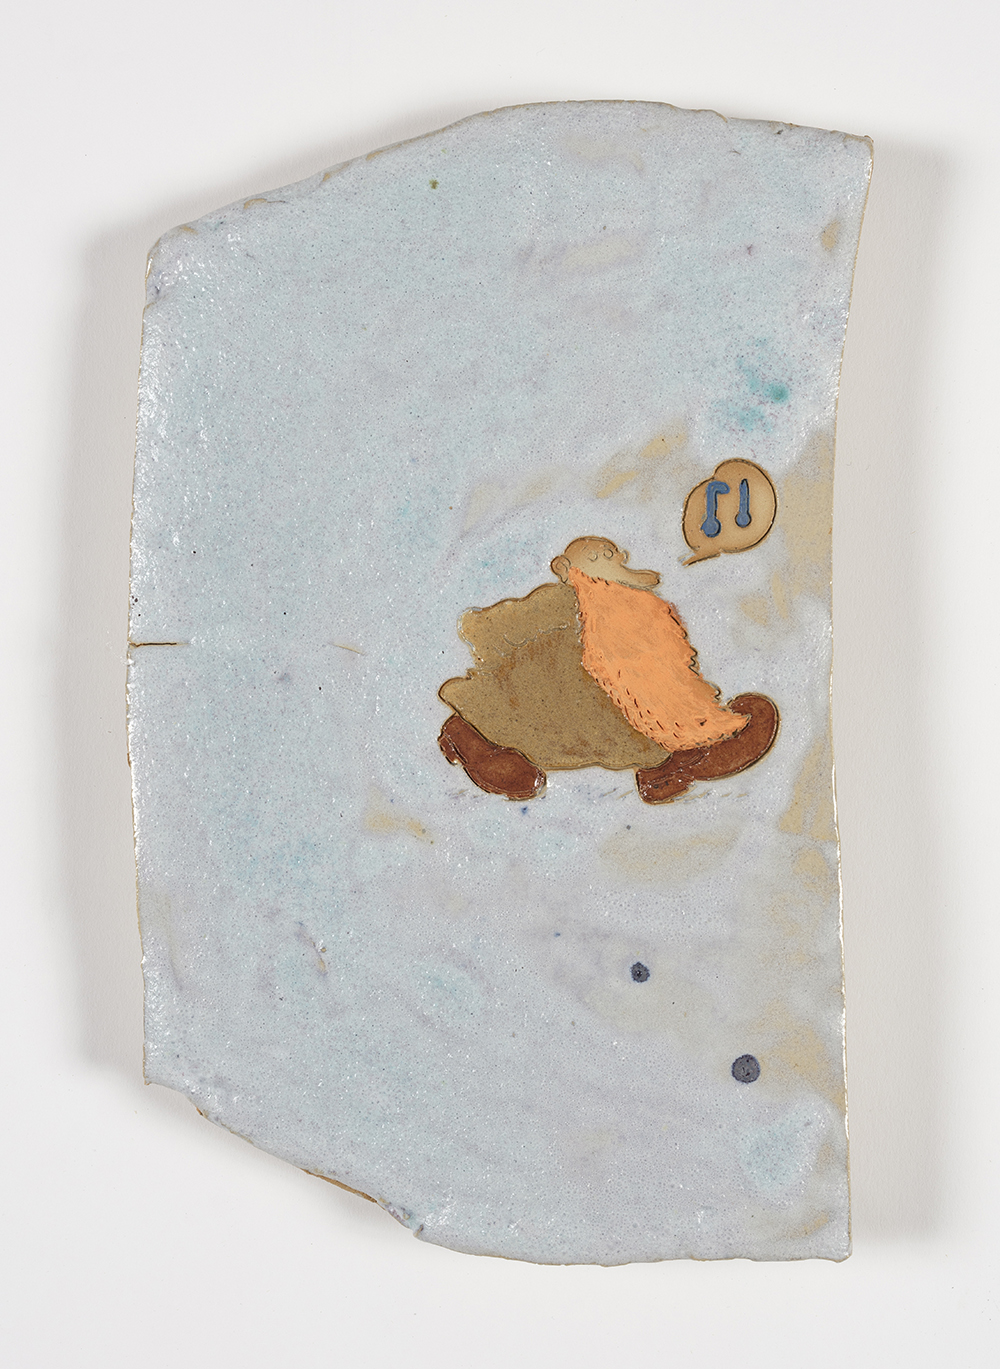 Kevin McNamee-Tweed.<em> Whistler</em>, 2019. Glazed ceramic, 12 1/2 x 7 1/2 inches (31.8 x 19.1 cm)